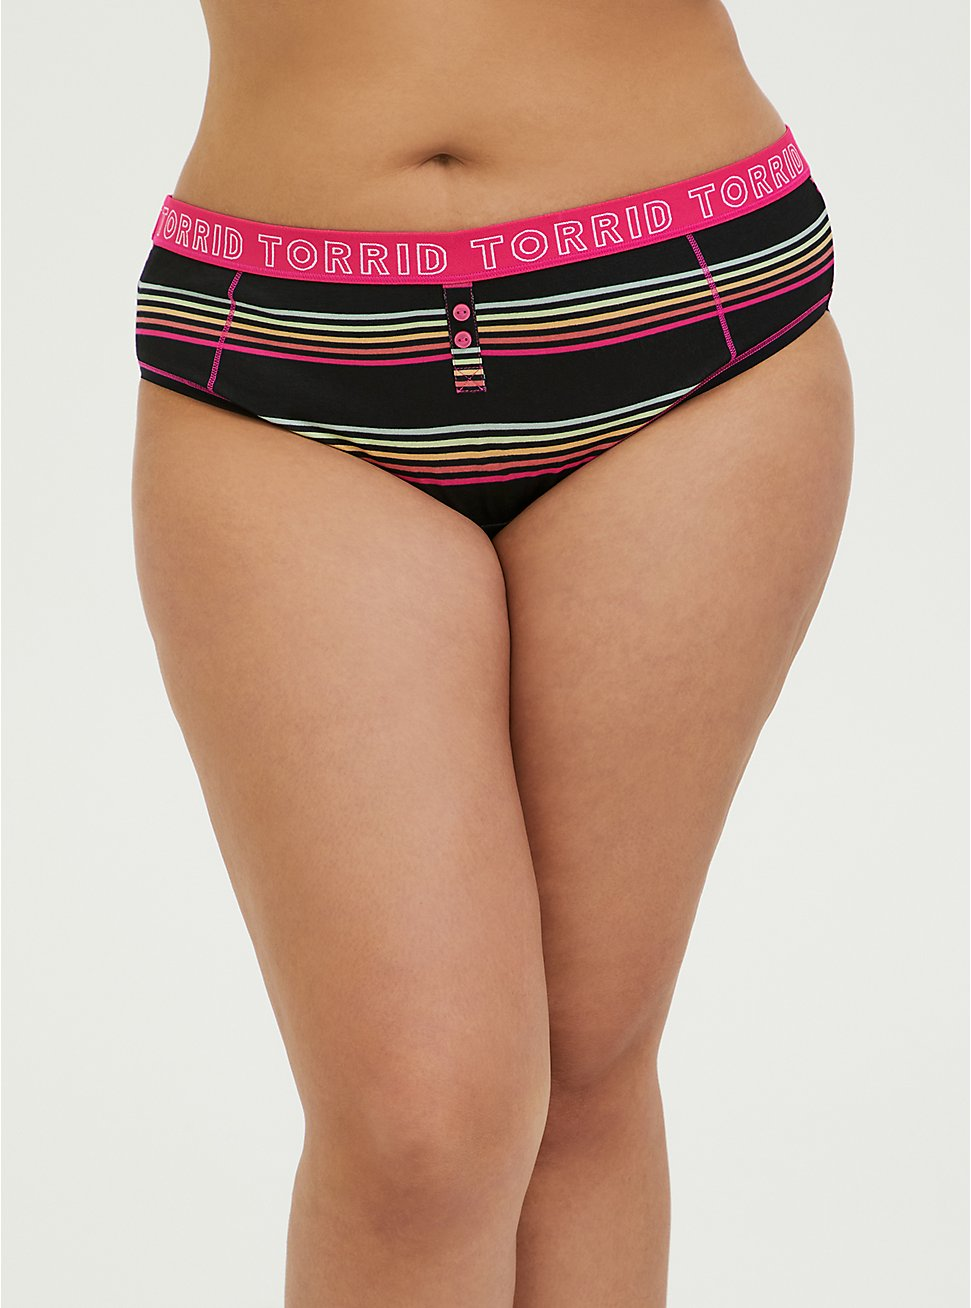 Plus Size Torrid Logo Black & Multi Stripe Cotton Hipster Panty, HORIZONTAL CHARMED- BLACK, hi-res